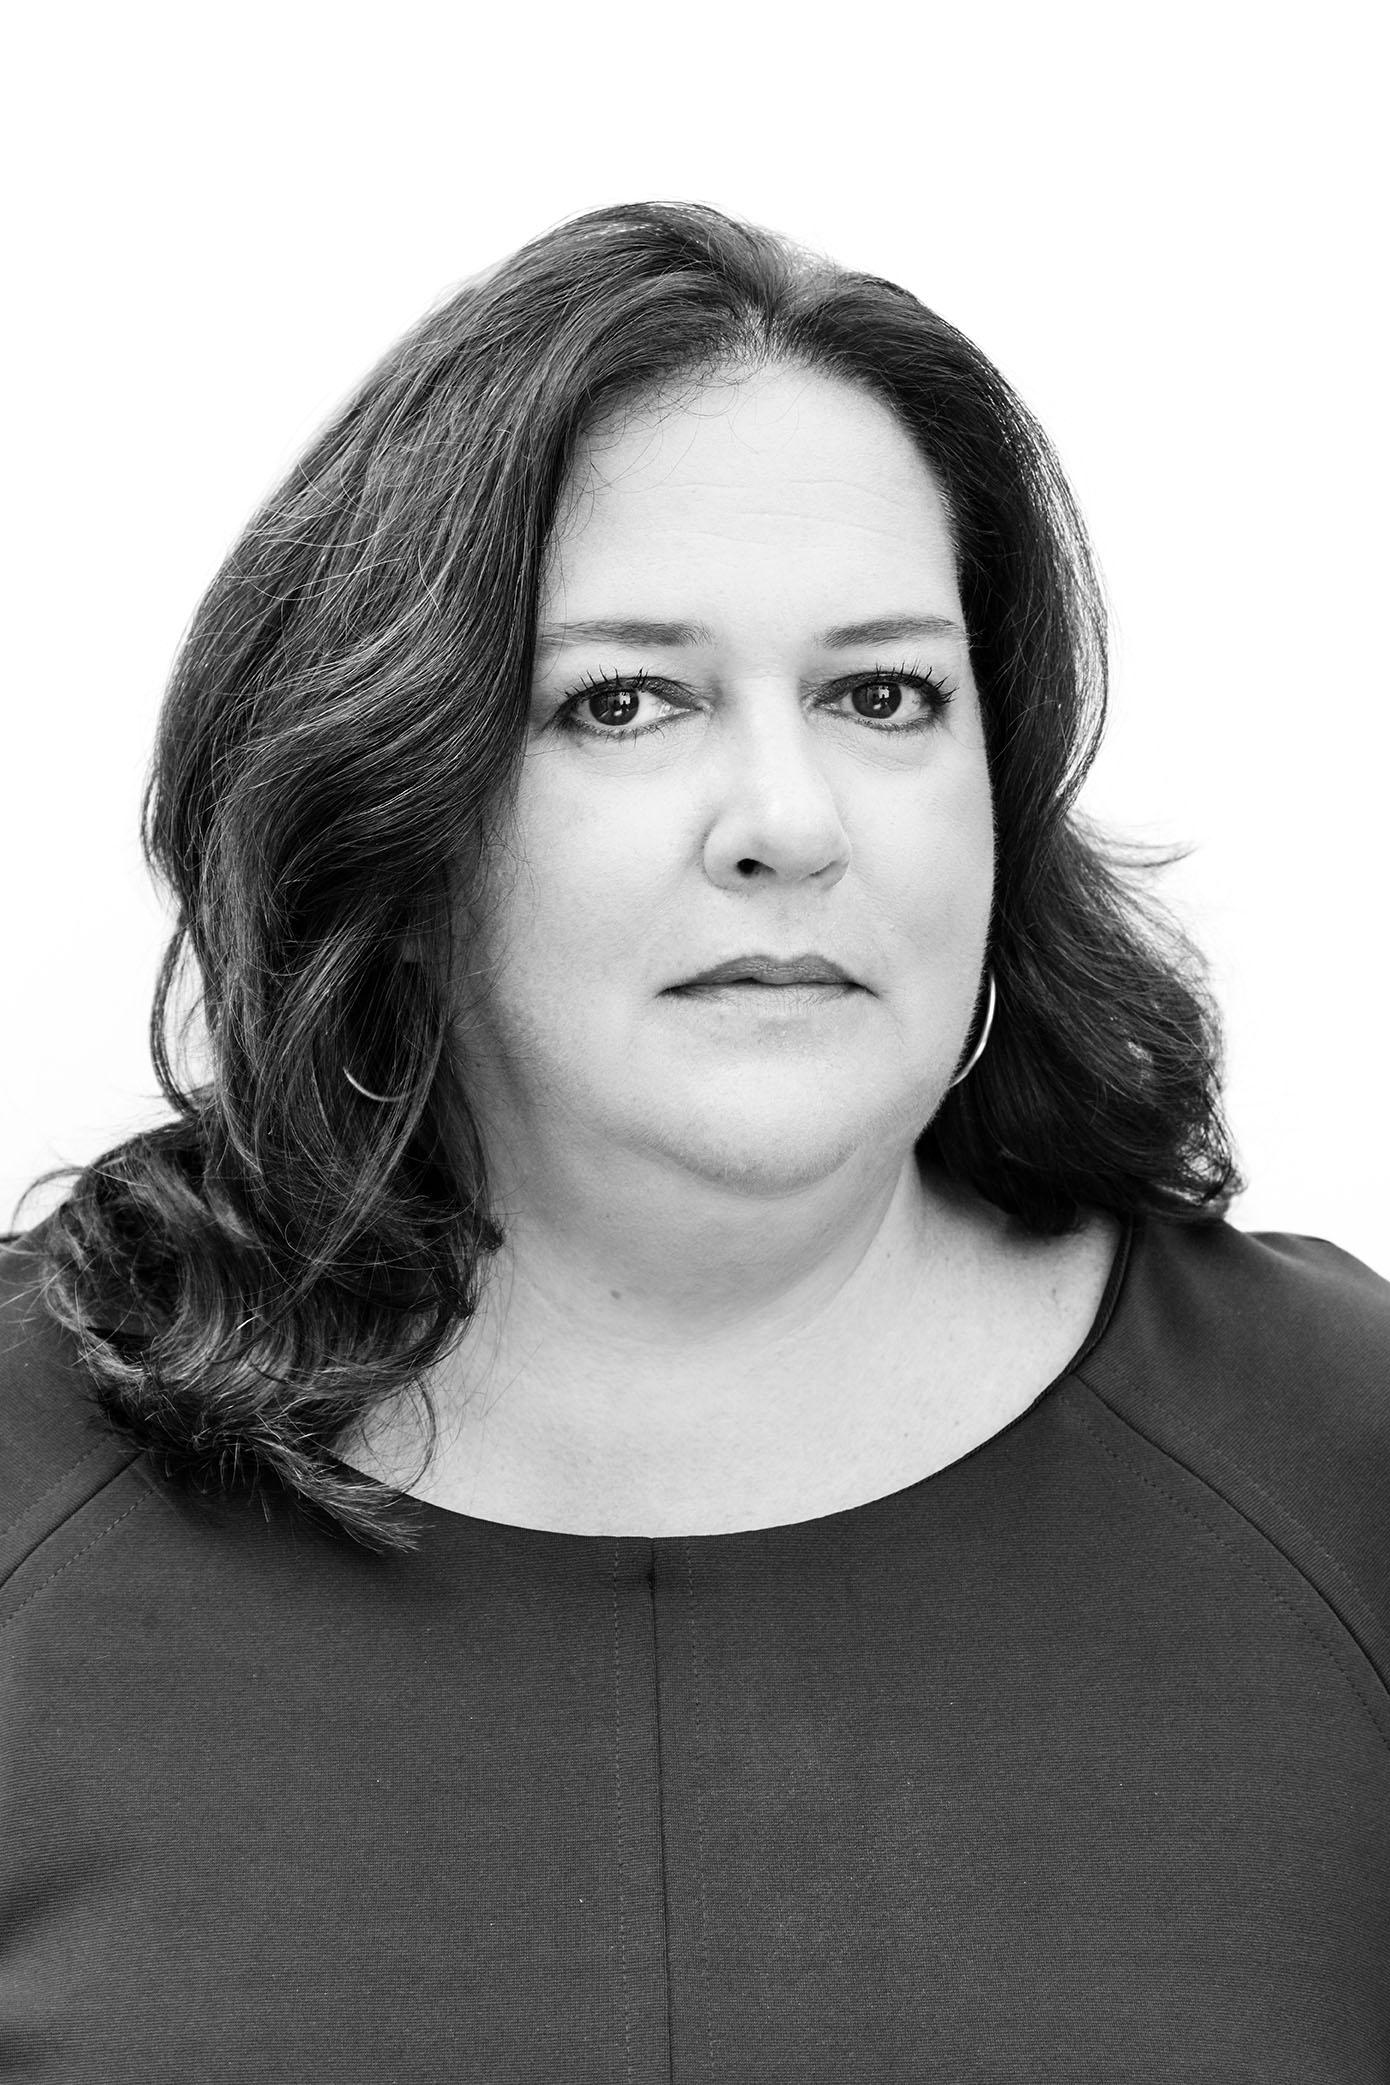 Christina D. Neault   Consultant - Fashion Programming & Events, Pier 59 Studios